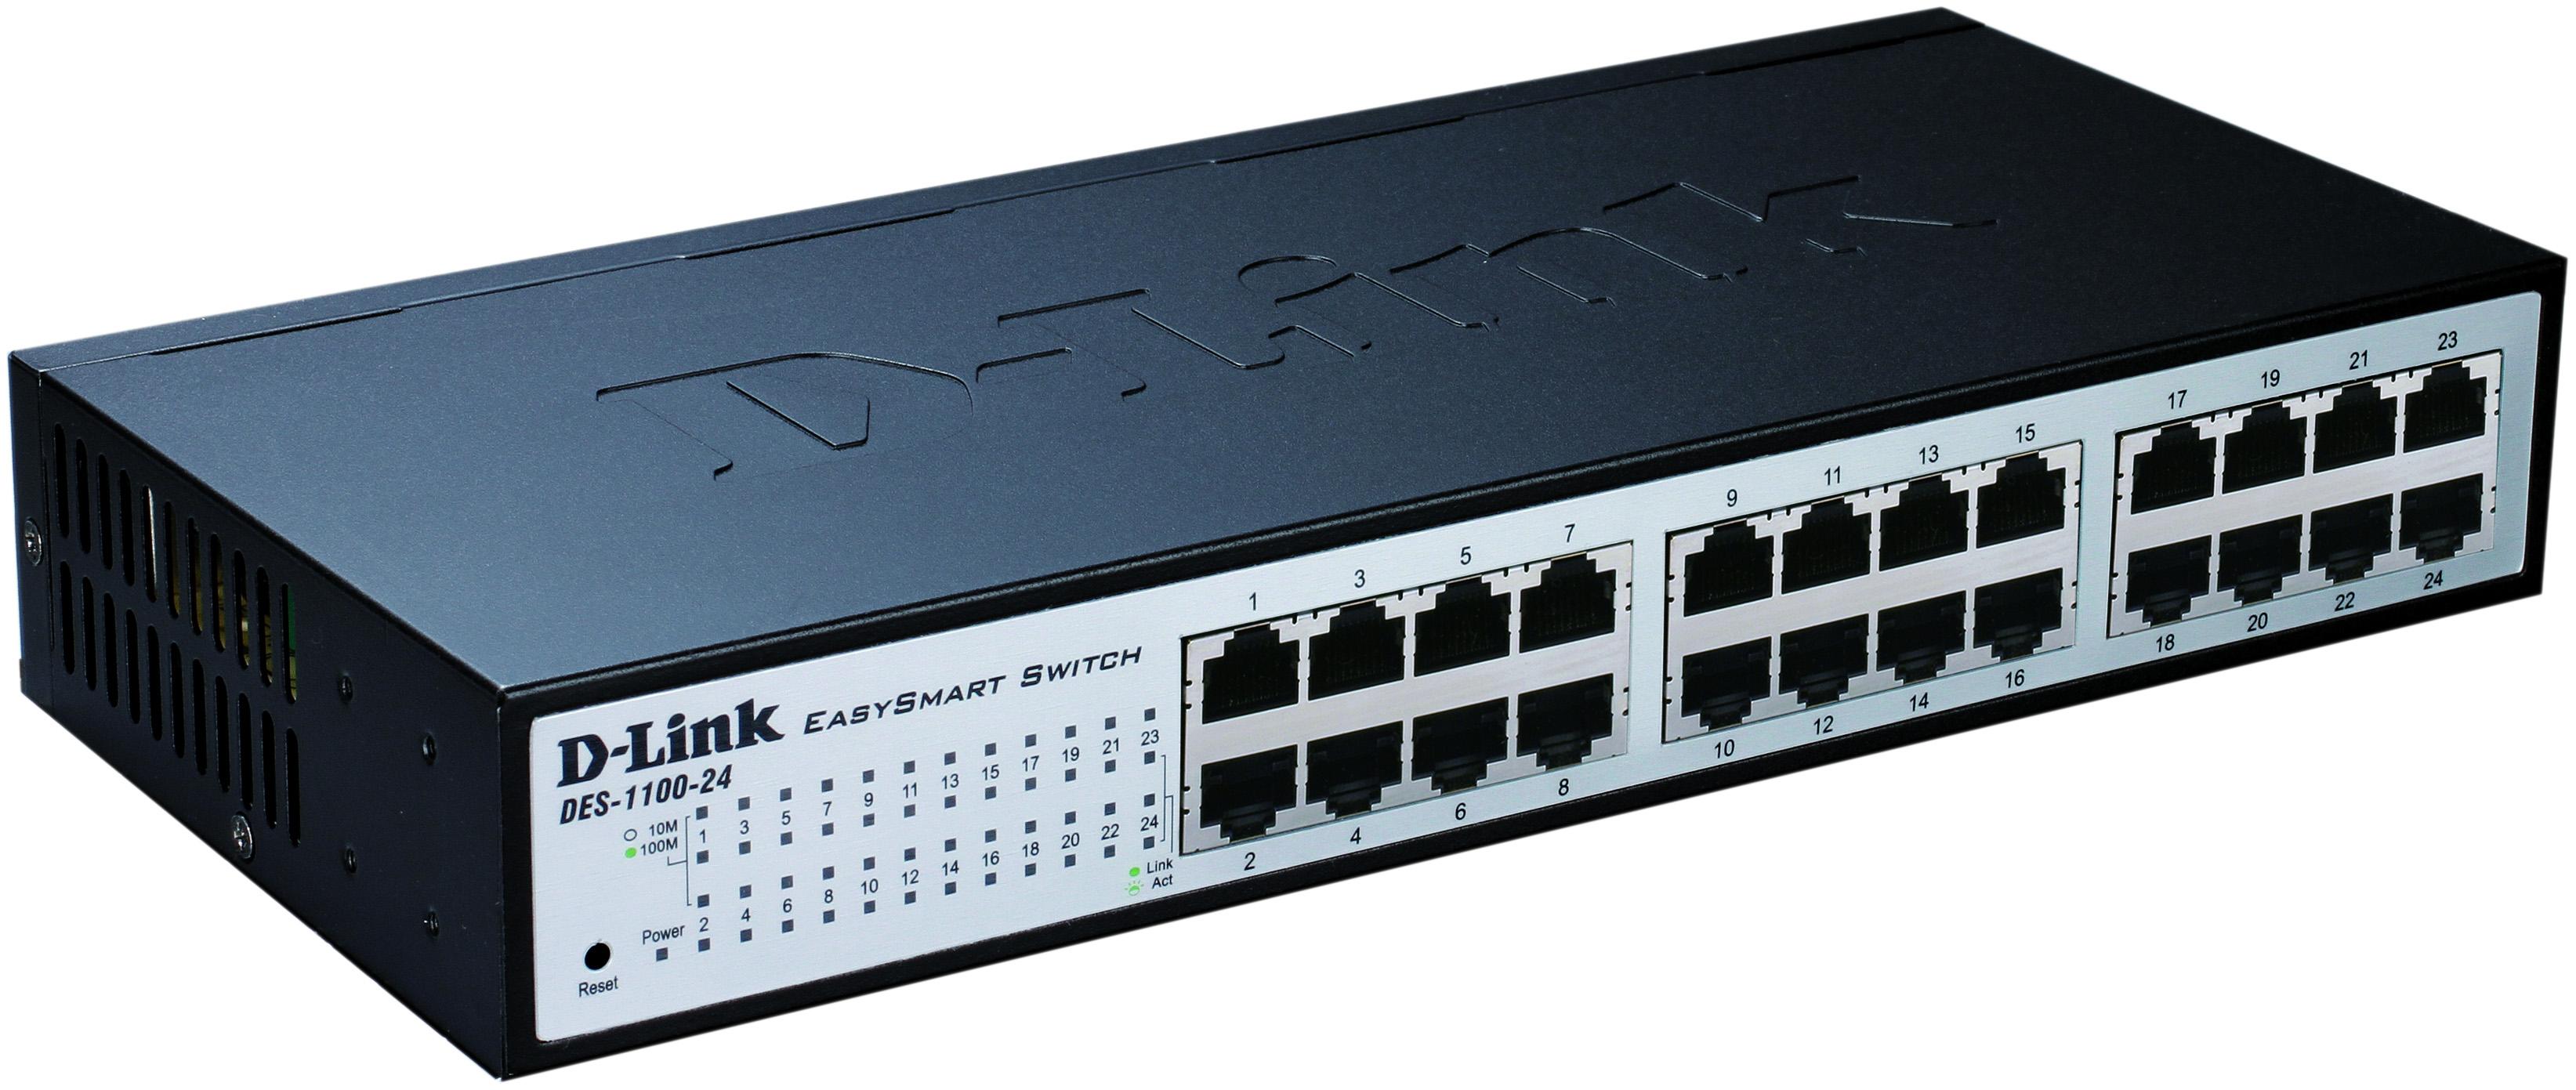 Коммутатор D Link EasySmart DES 1100